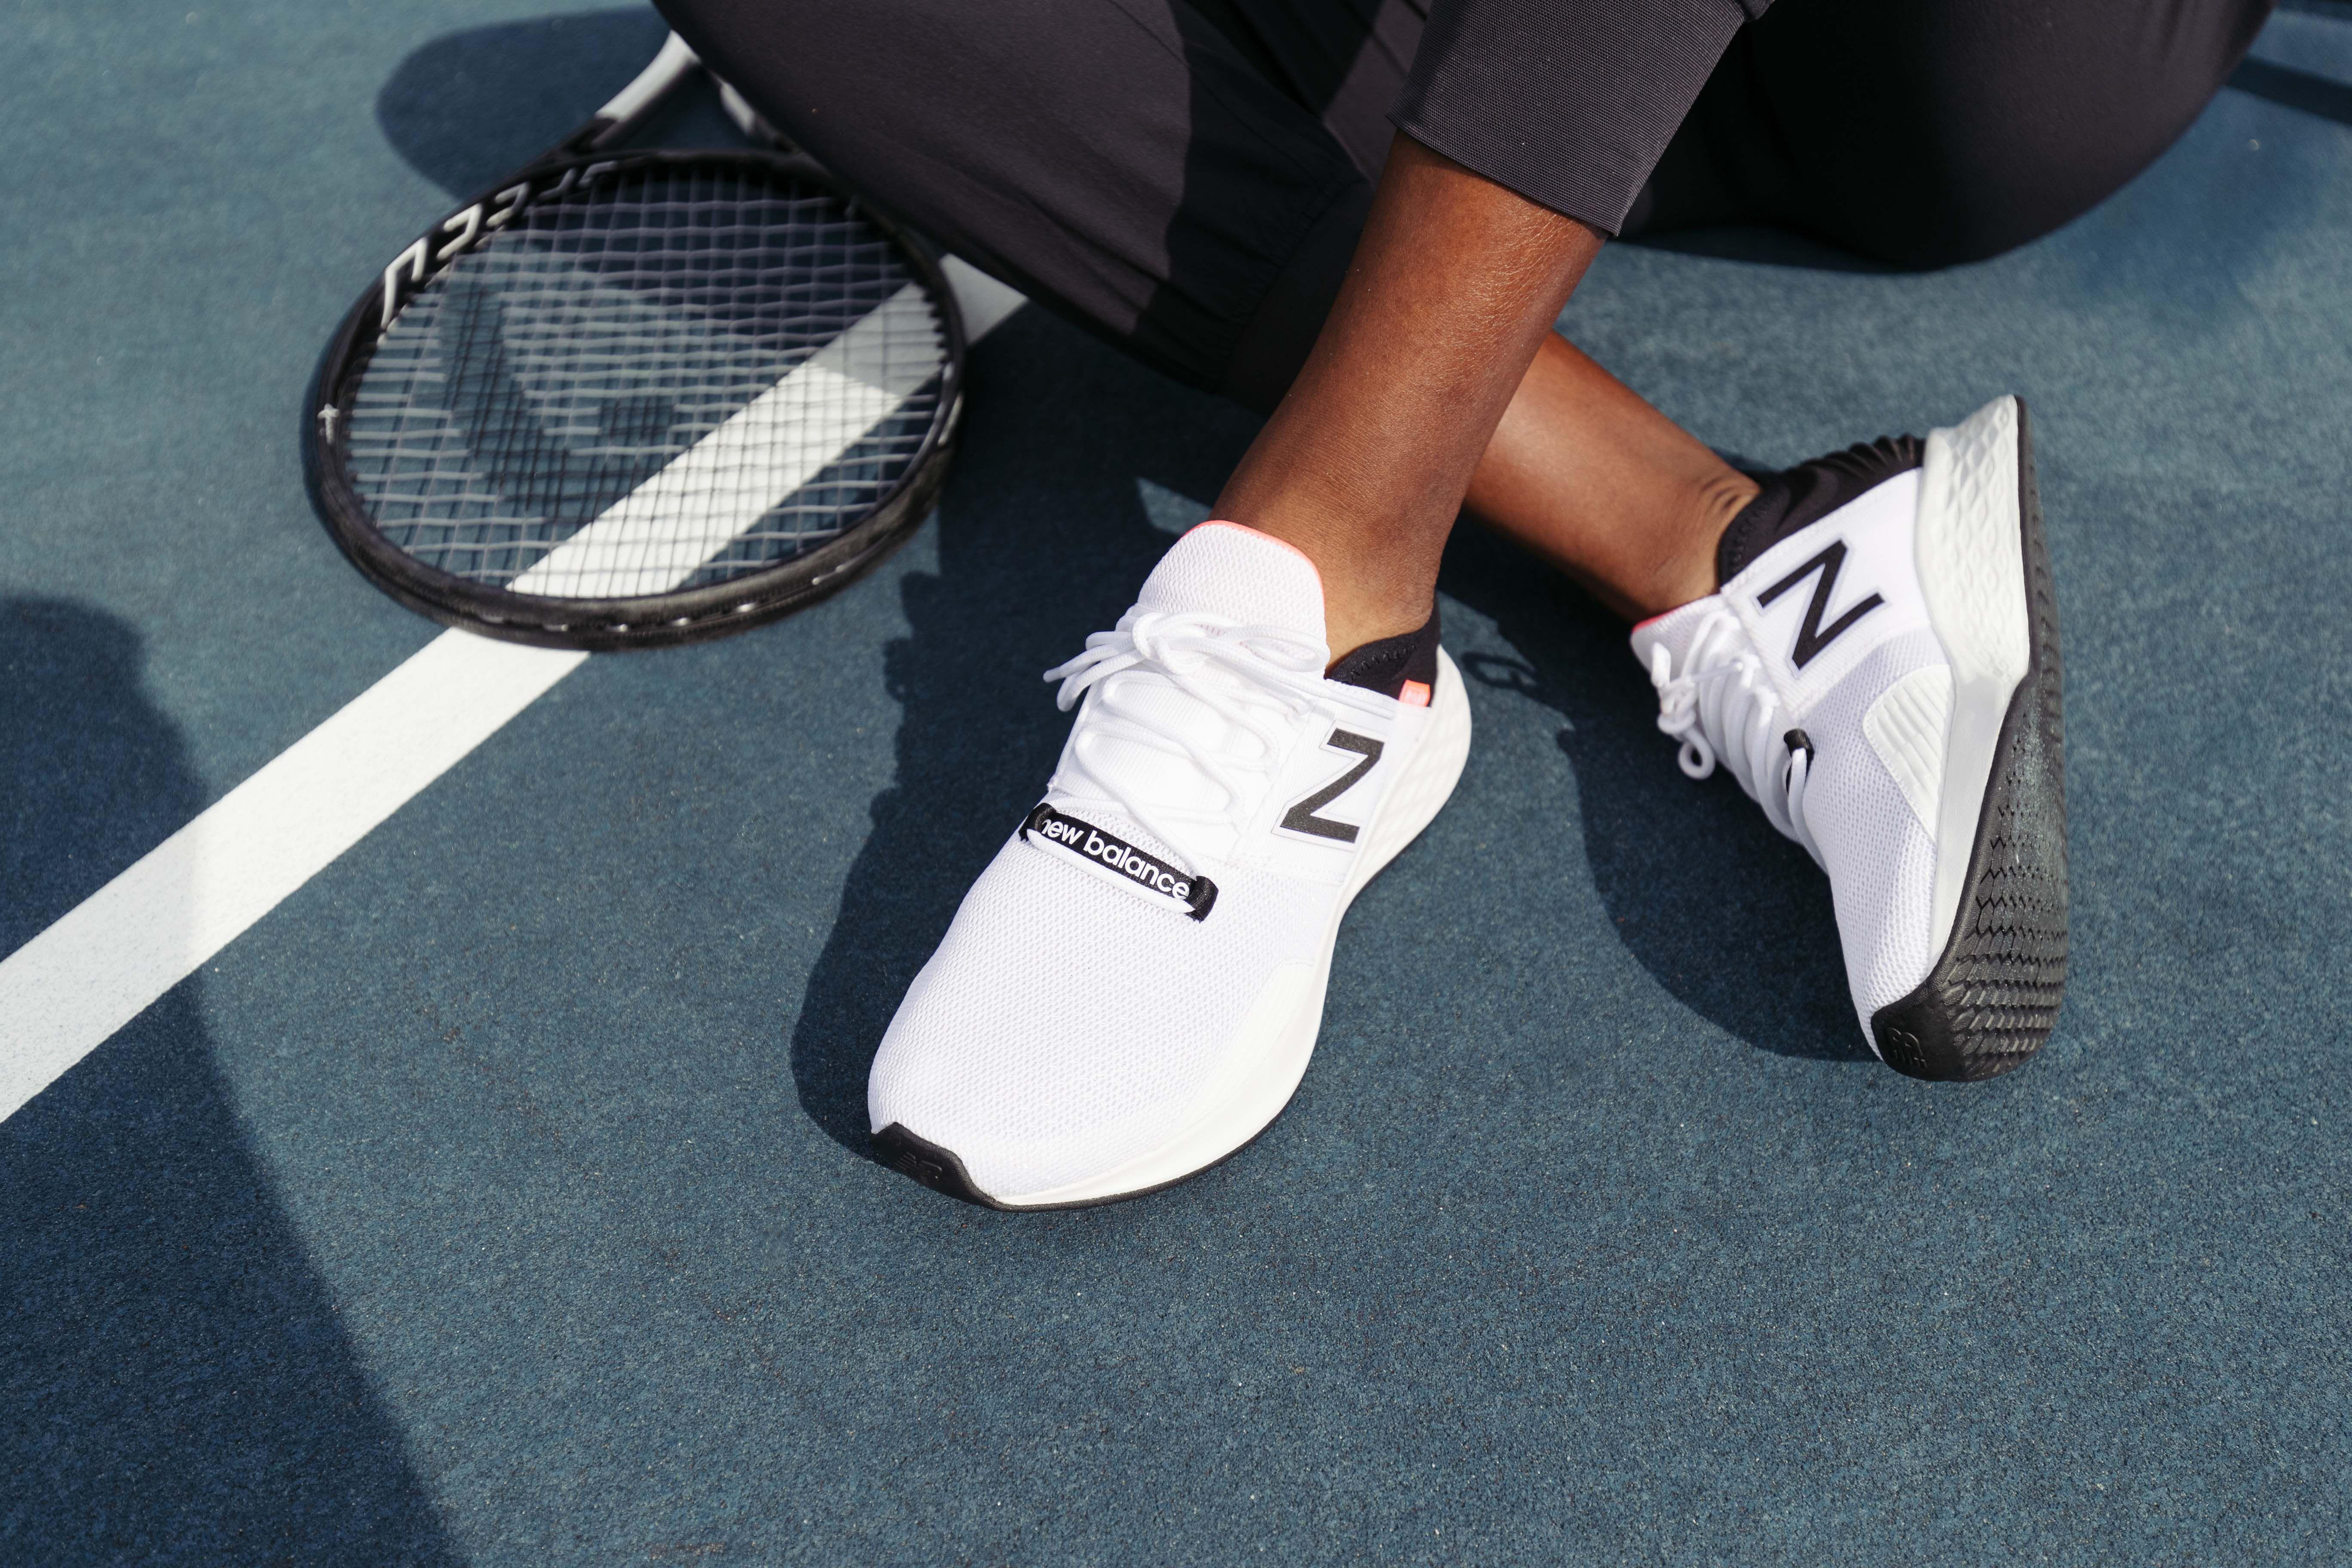 Nike golf shoes, Asics running shoes